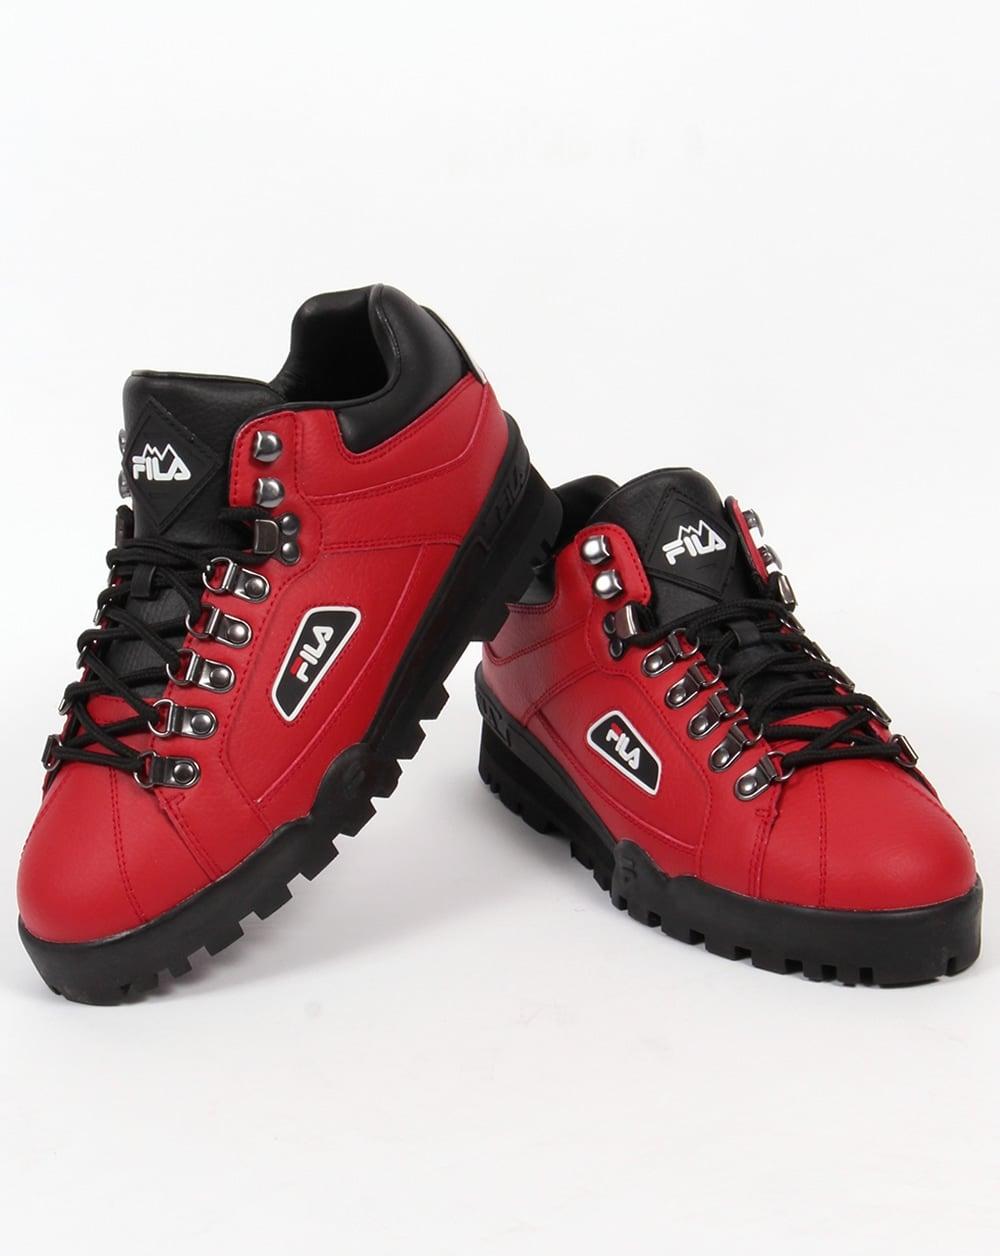 Fila Vintage Trailblazer Boots Red Leather Hiking Mens Biking